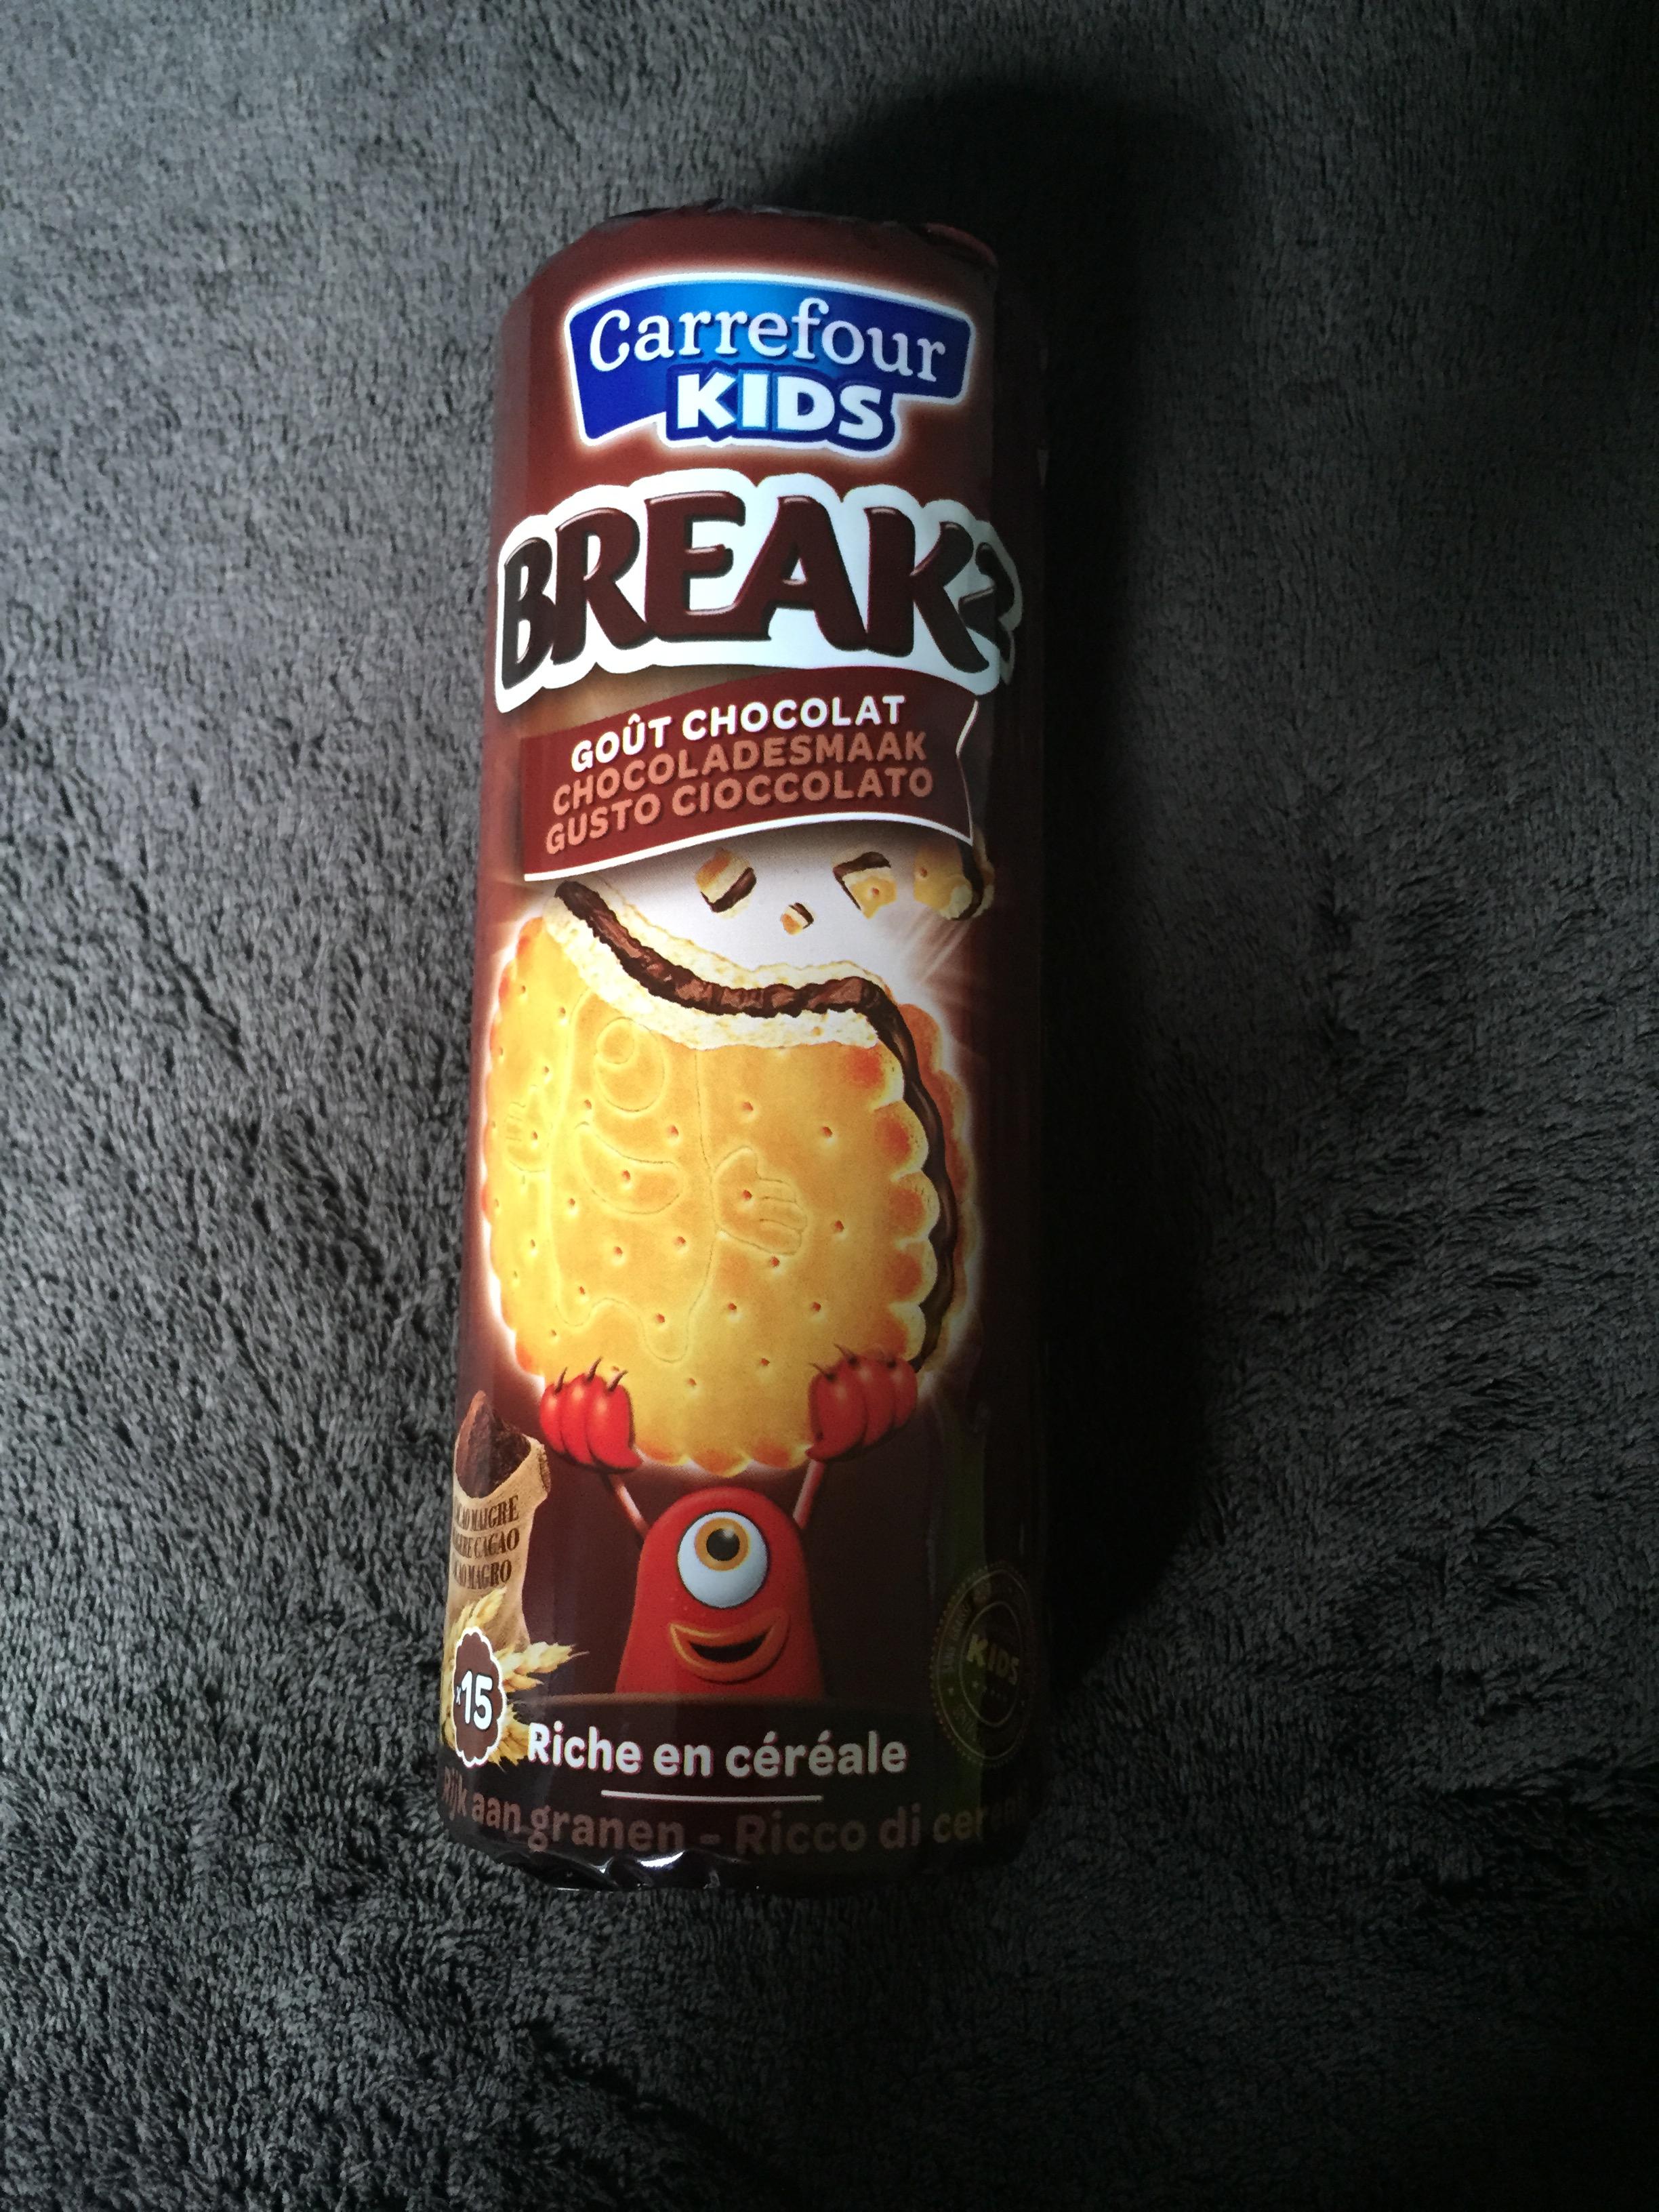 Carrefour Kids Breakz Chocolat Dunking Thursdays